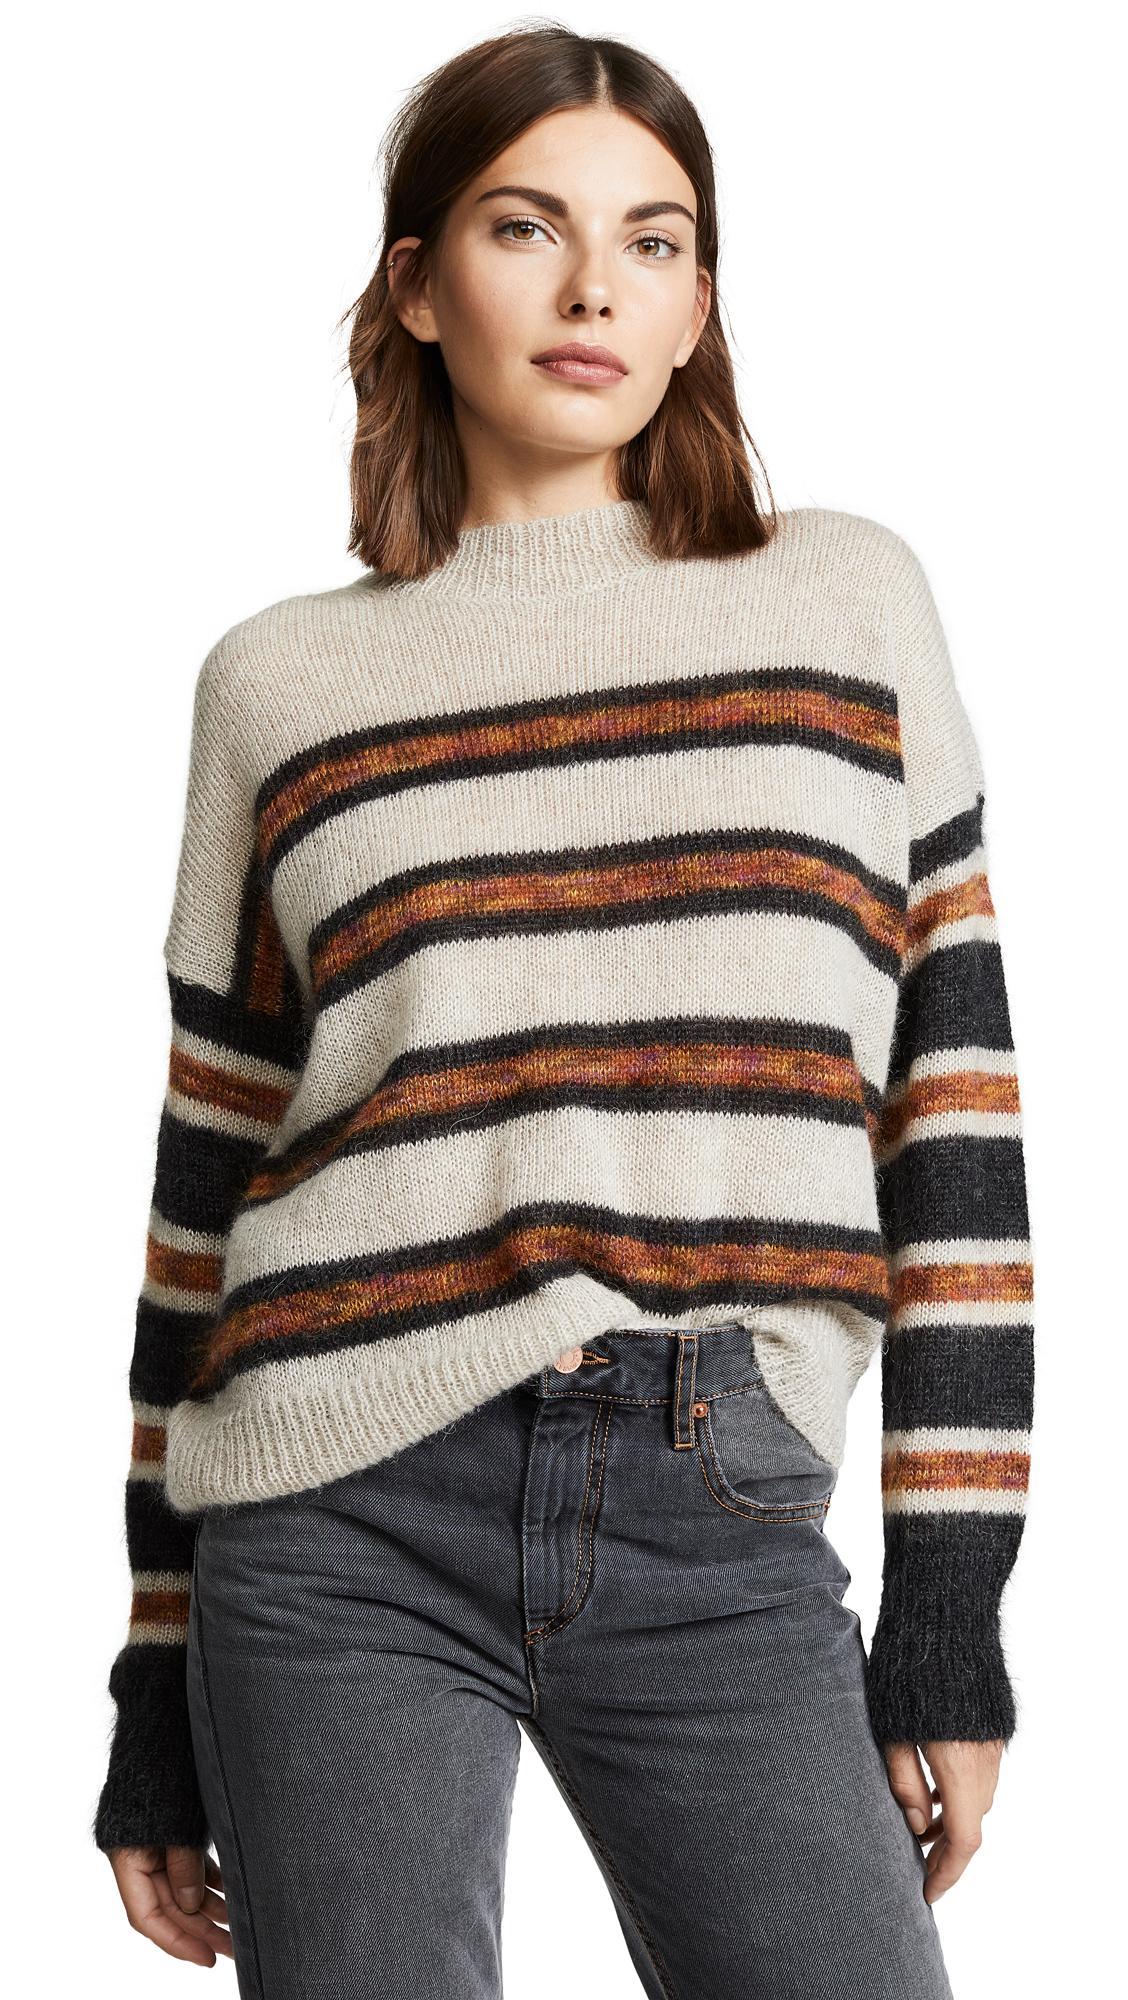 50303e9d8f Etoile Isabel Marant Isabel Marant Etoile White And Black Mohair Russel  Sweater In Ecbk Ecru/